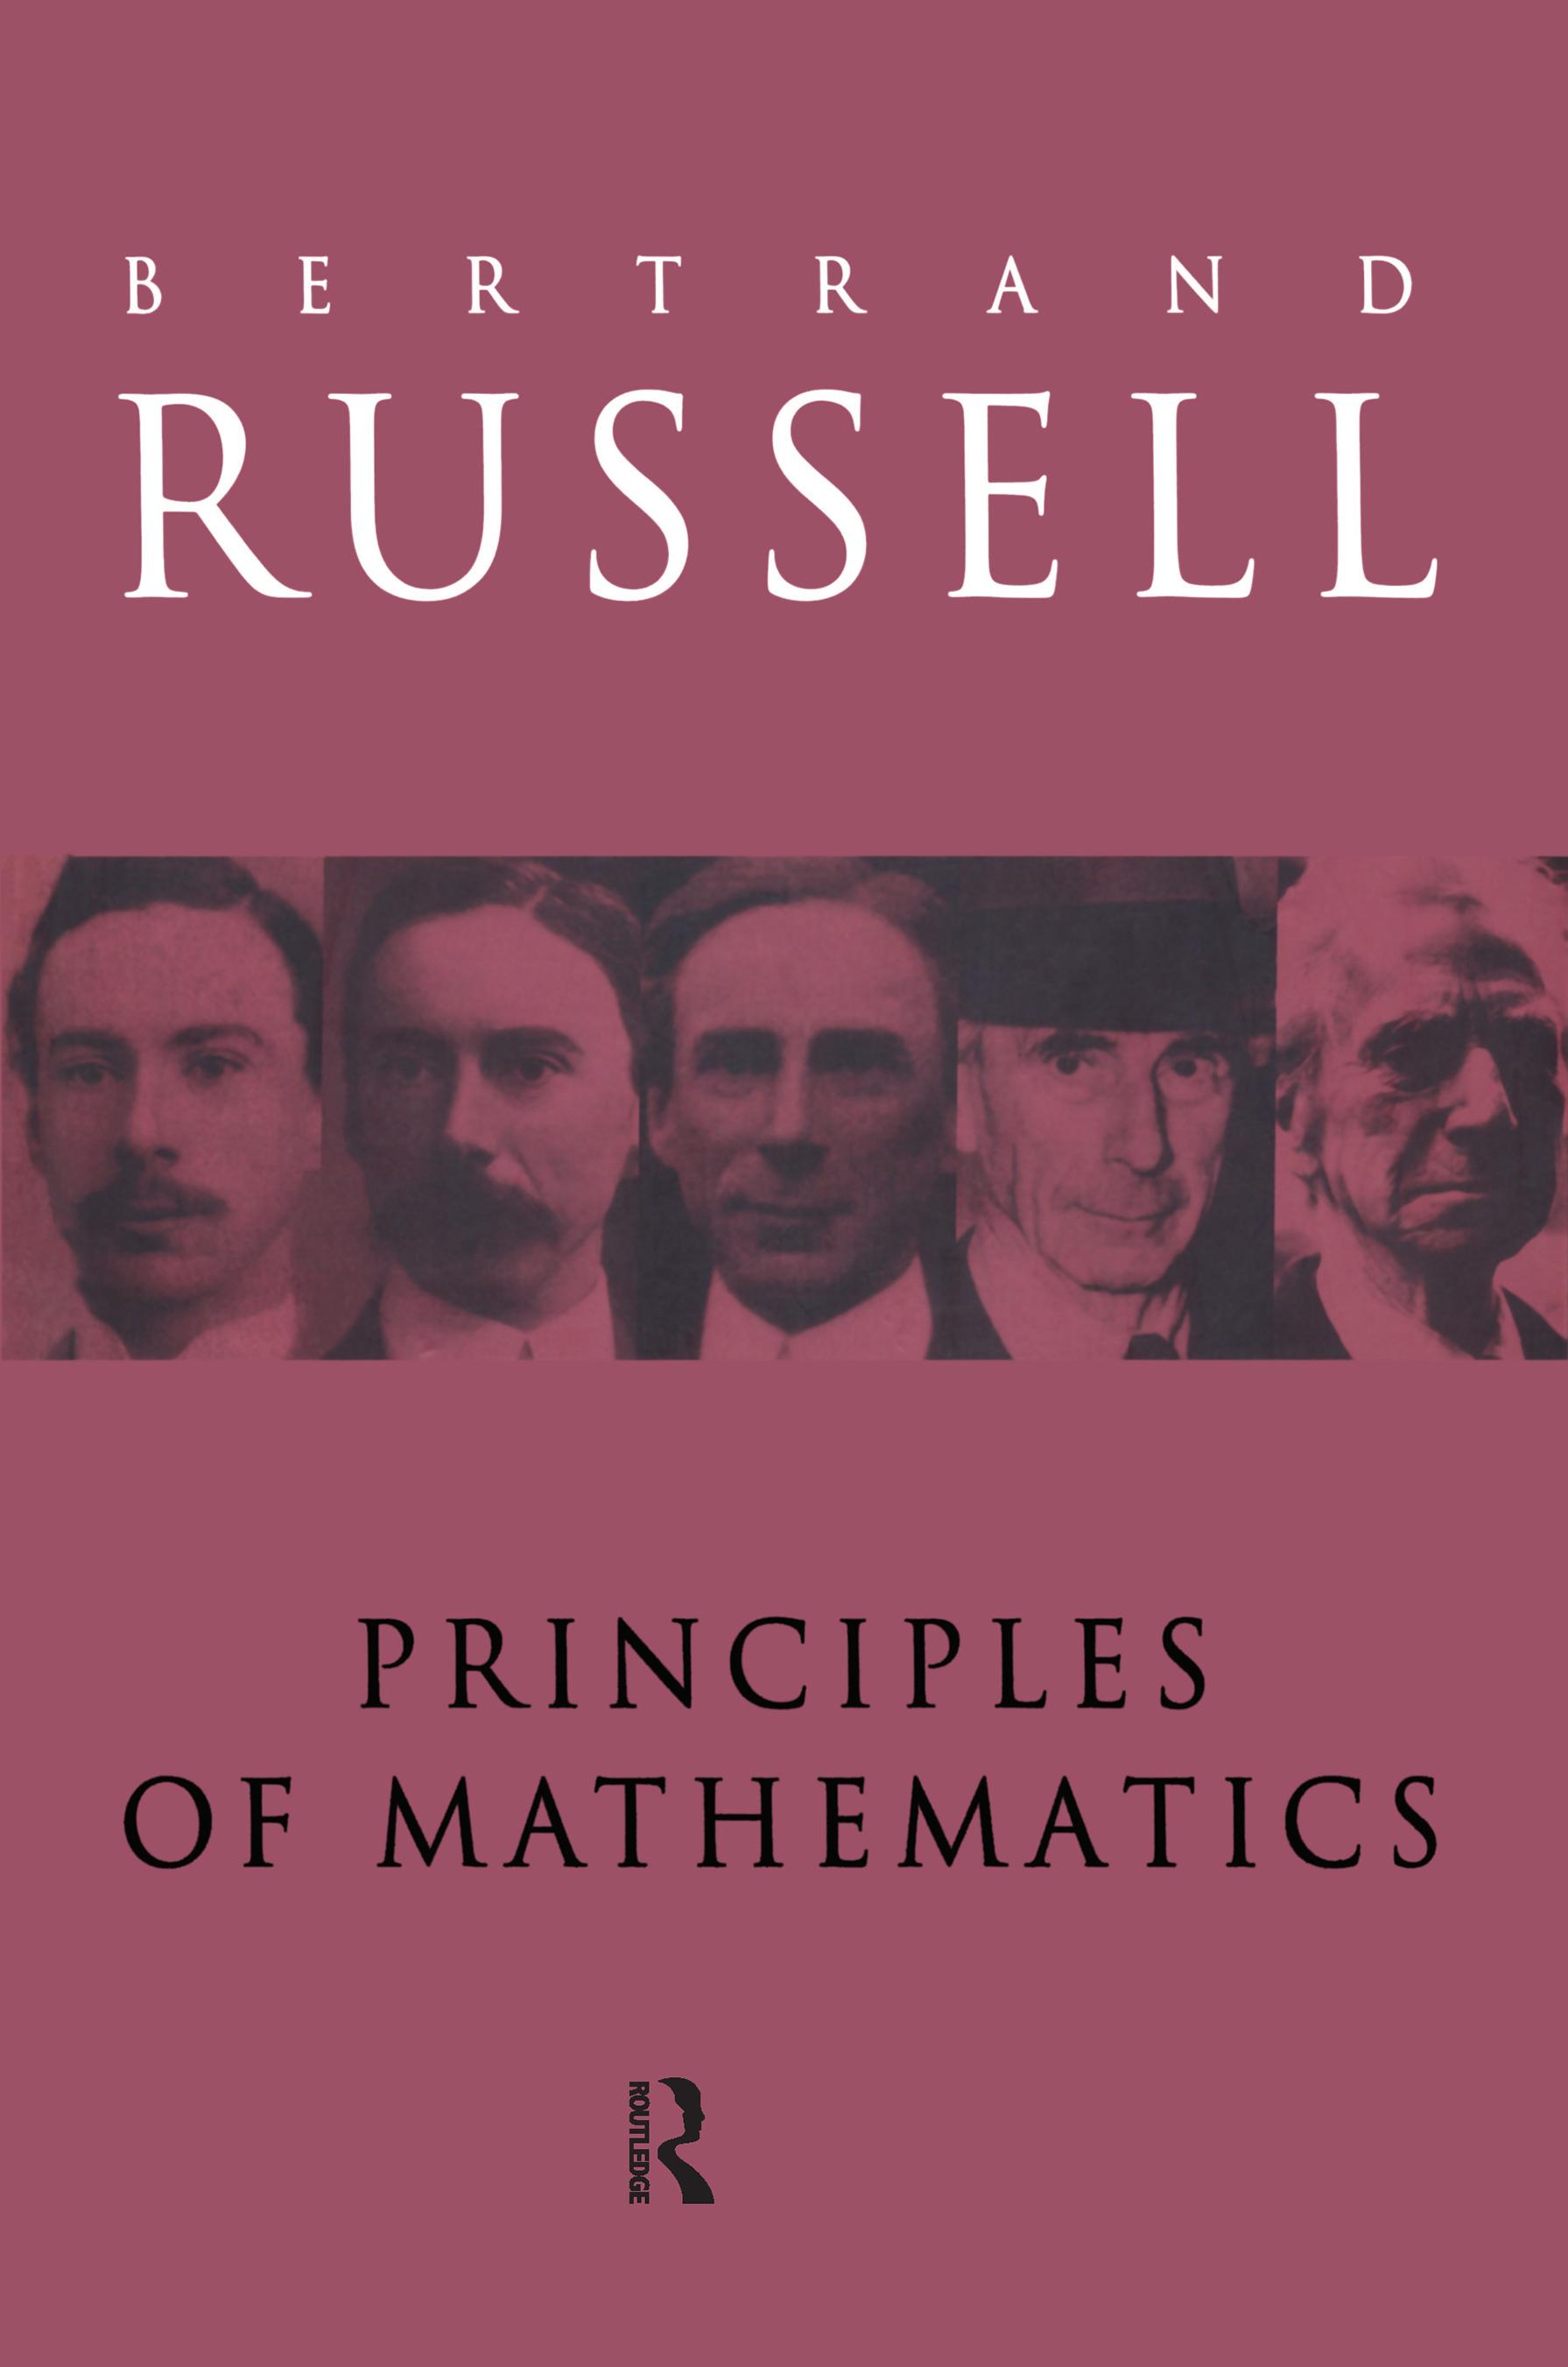 Principles of Mathematics book cover